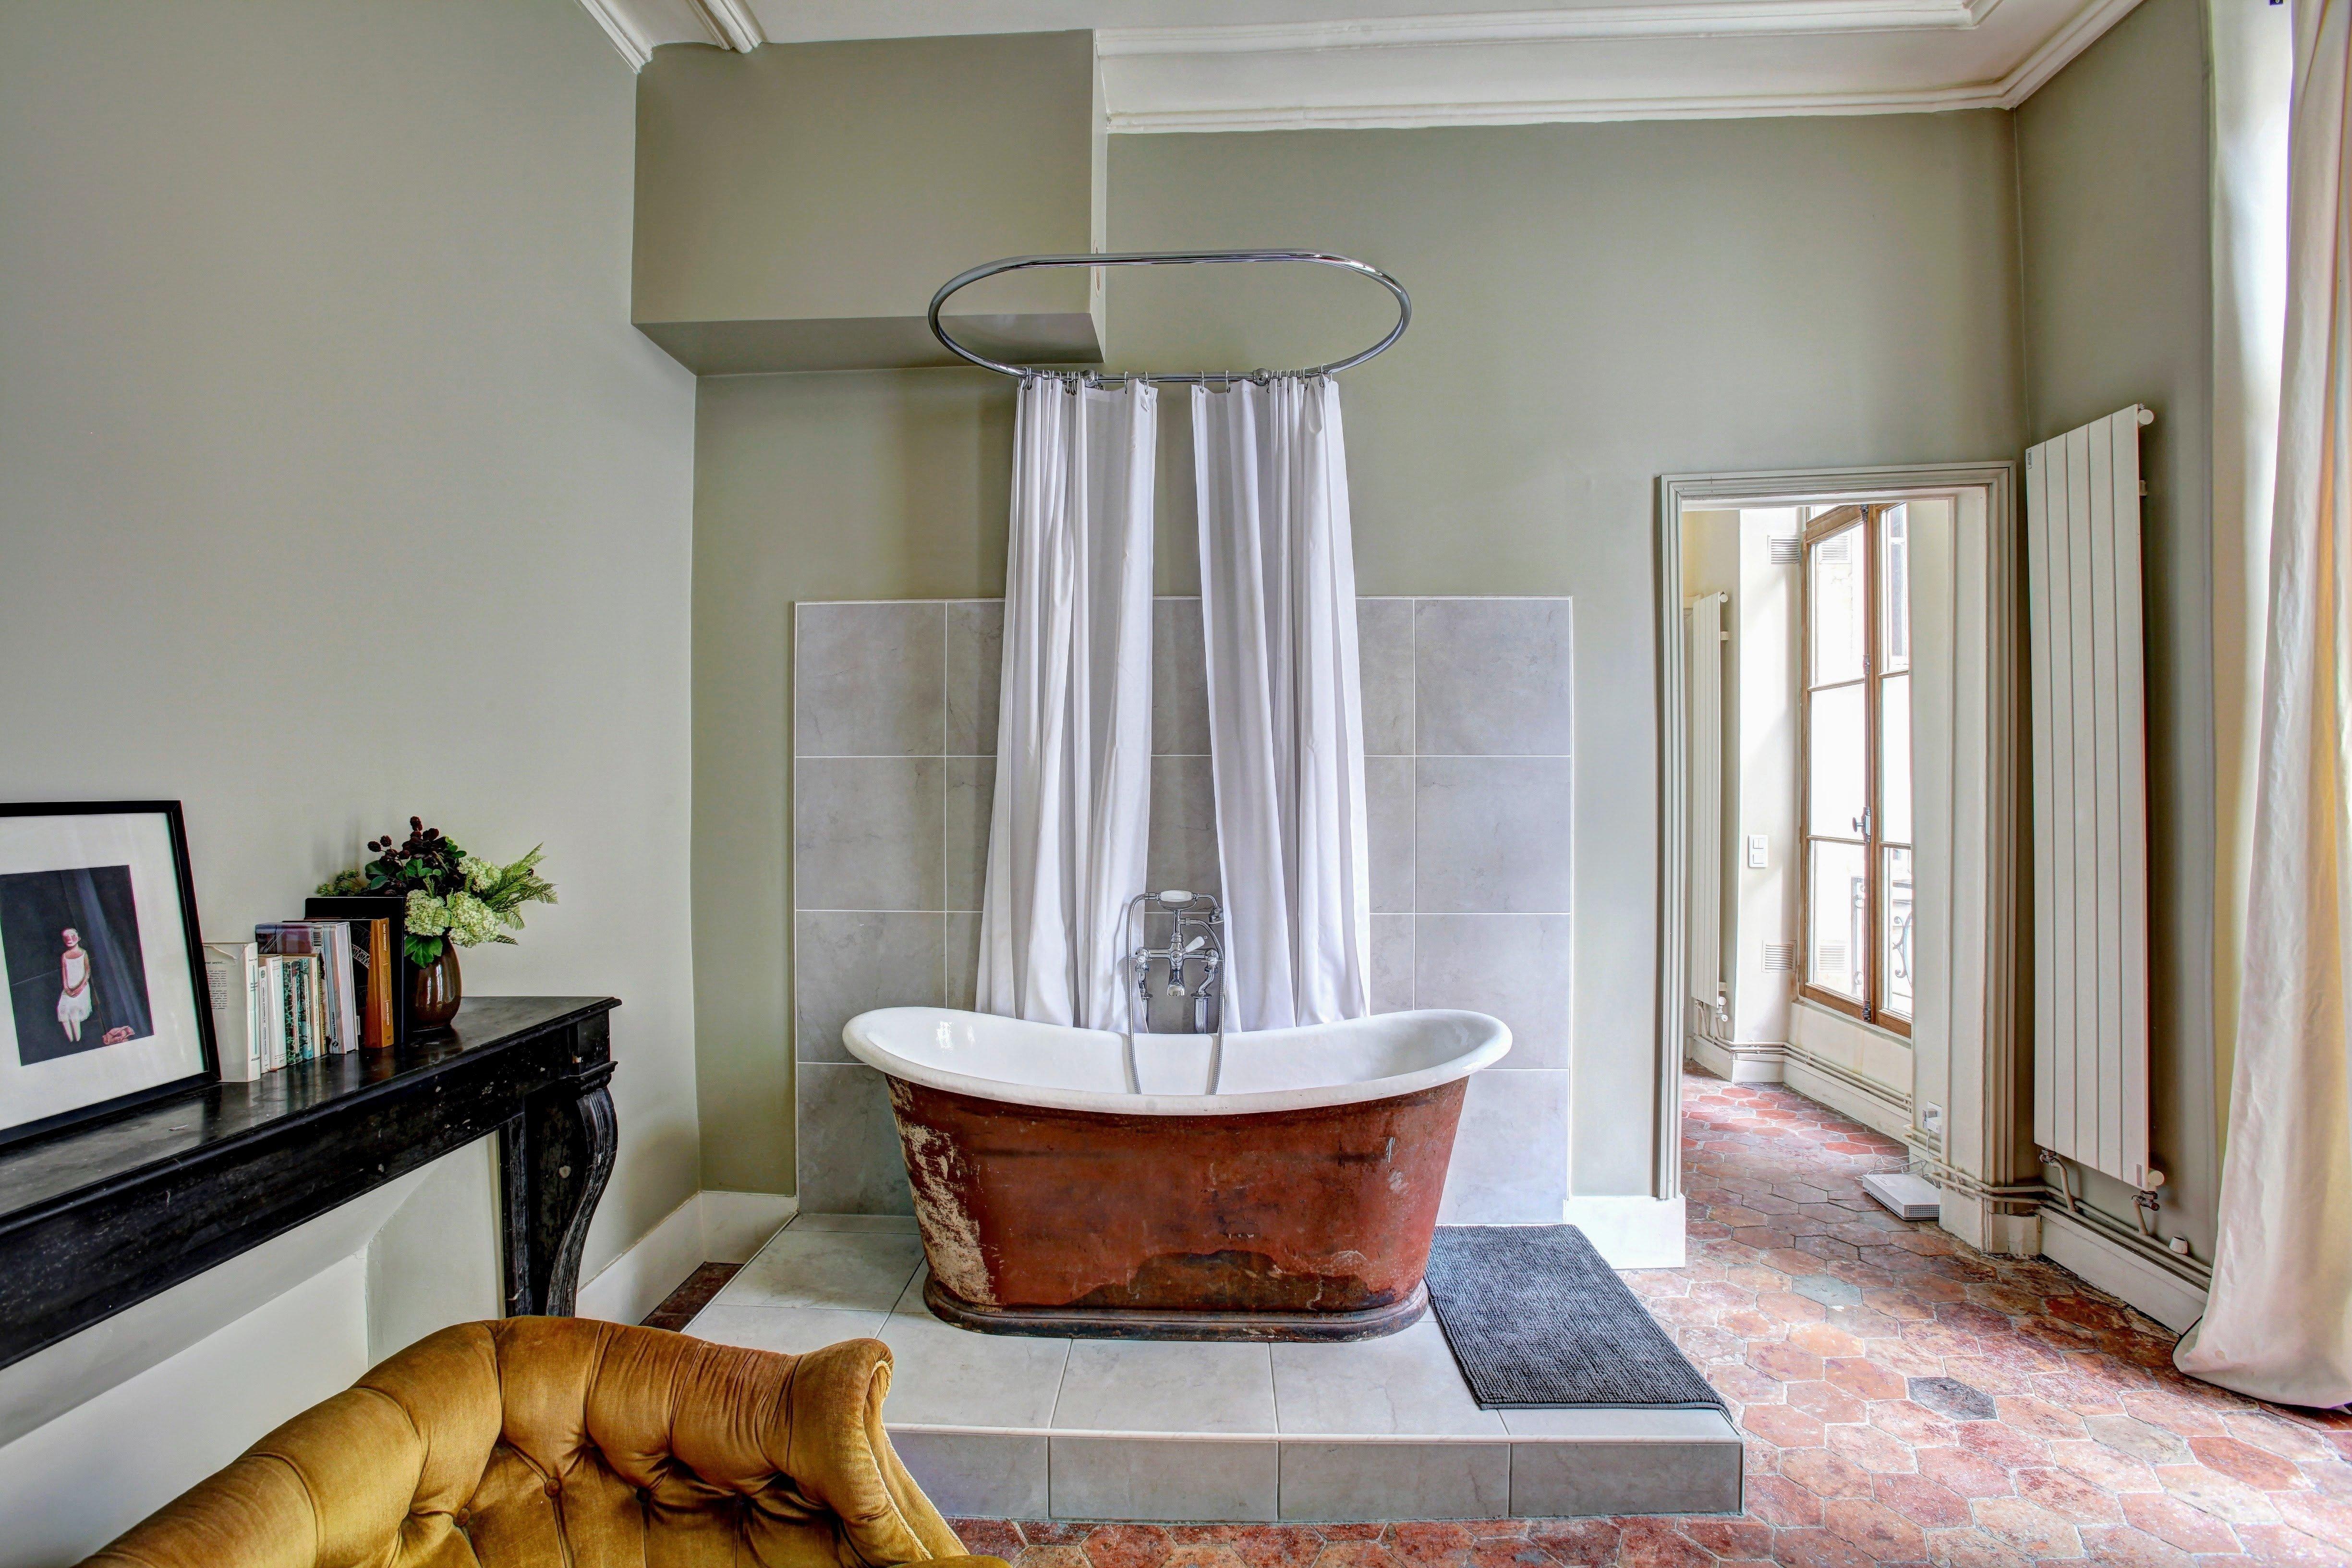 copper bathtub curtain large bathroom interior design what is airbnb fromlusttilldawn.com lust till dawn